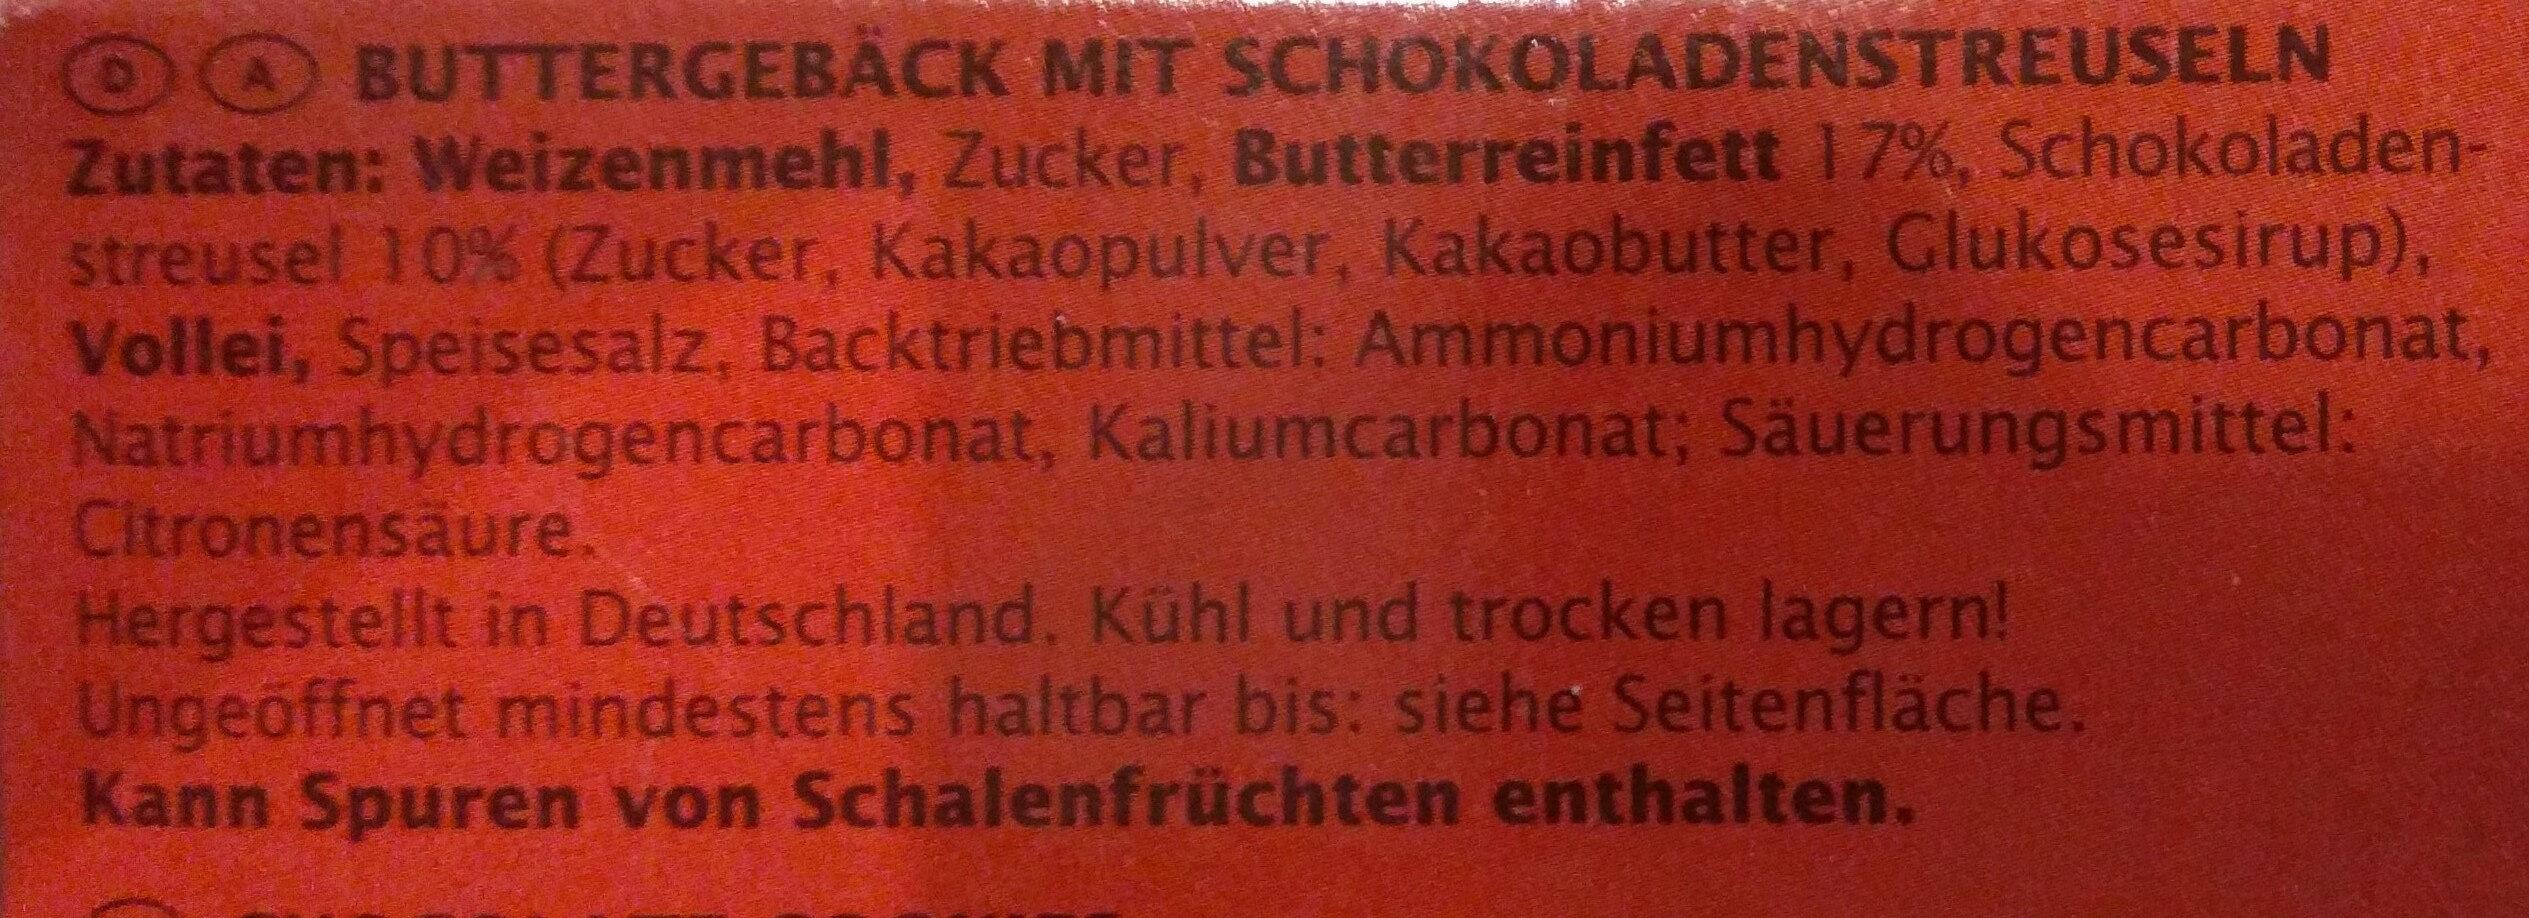 Schokotaler - Ingrédients